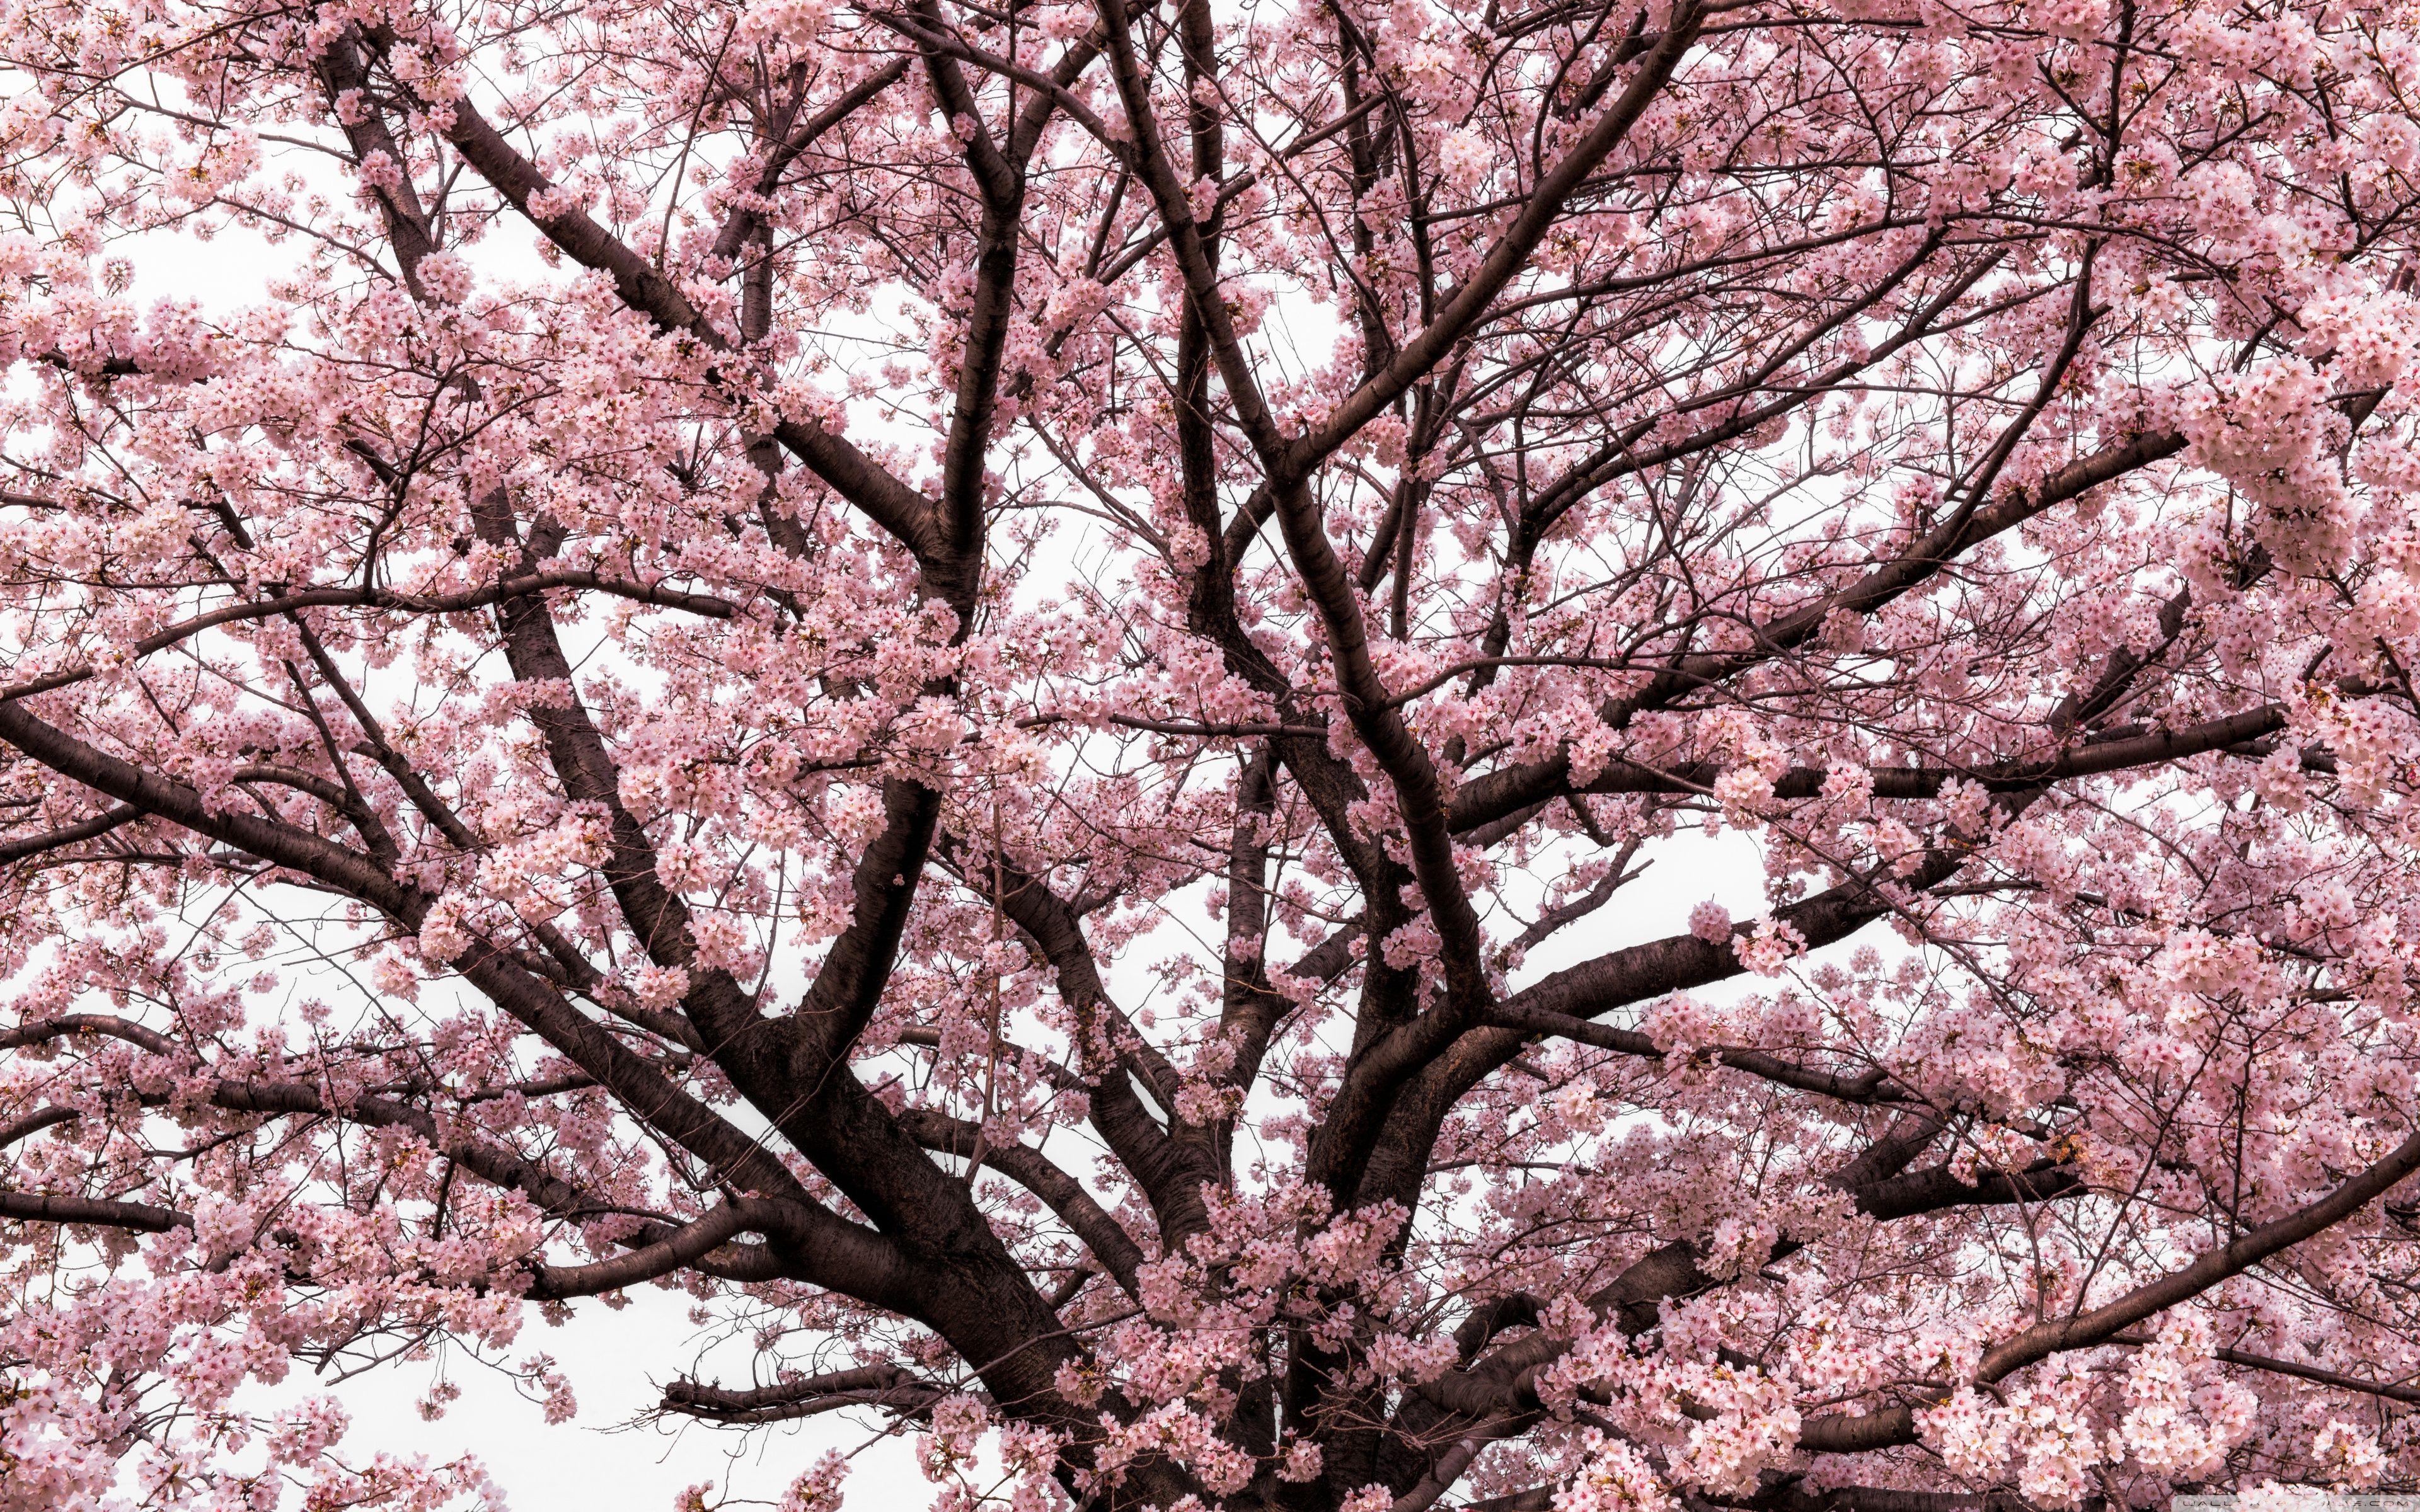 Japanese Cherry Blossom Tree Hd Desktop Wallpaper Widescreen Japanese Cherry Tree Spring Wallpaper Japanese Cherry